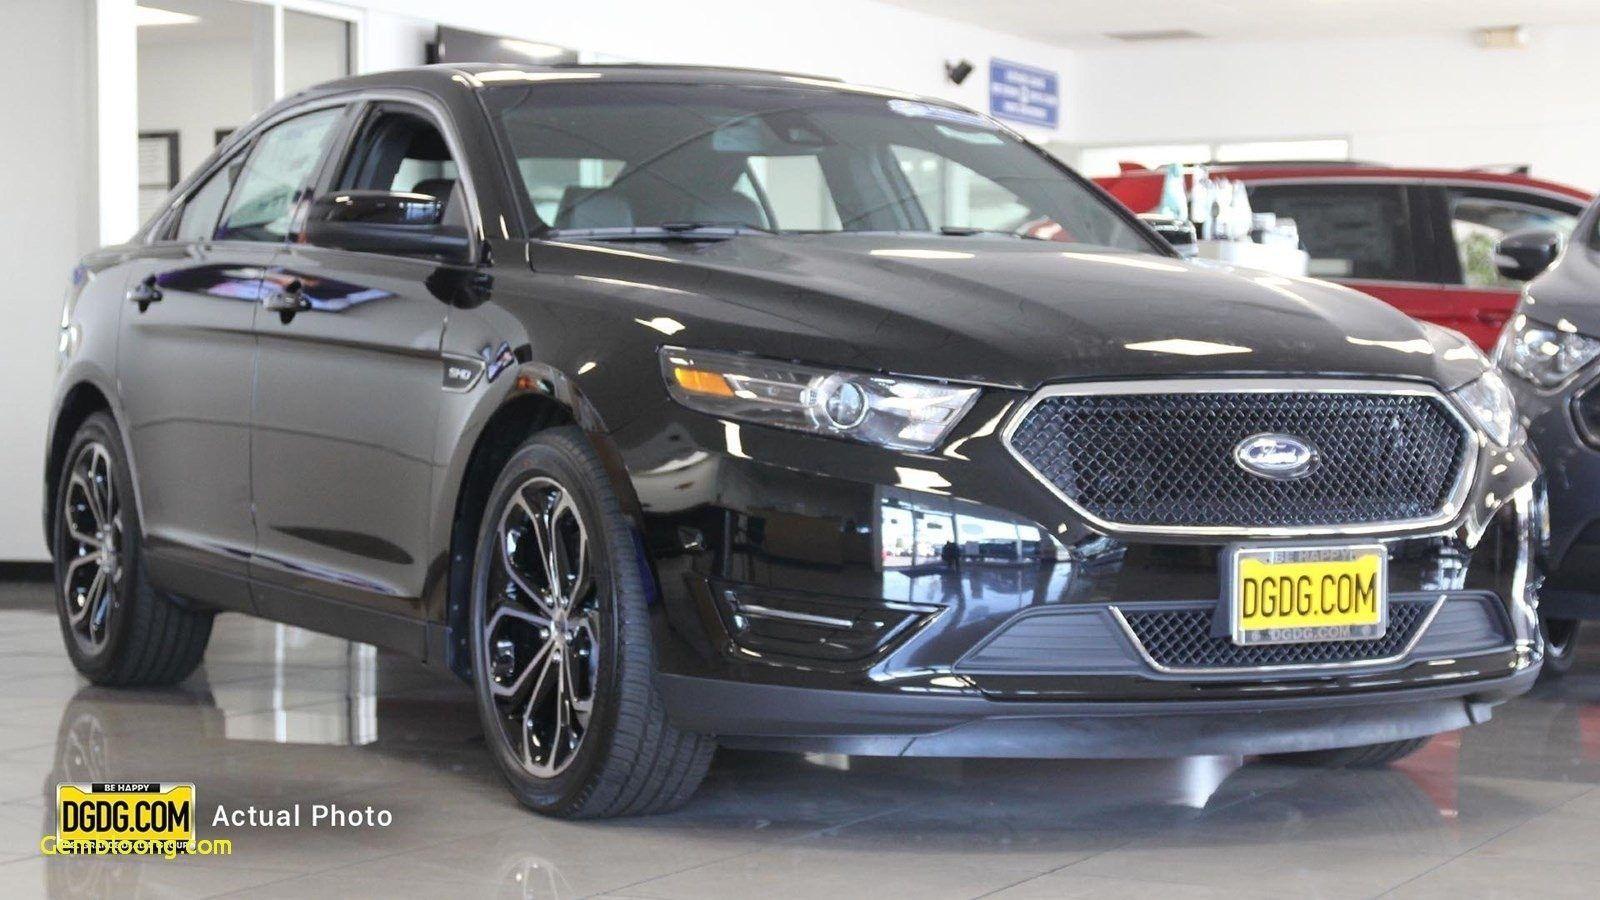 2020 Ford Taurus Spy Price Reviews Ford Taurus Ford Explorer